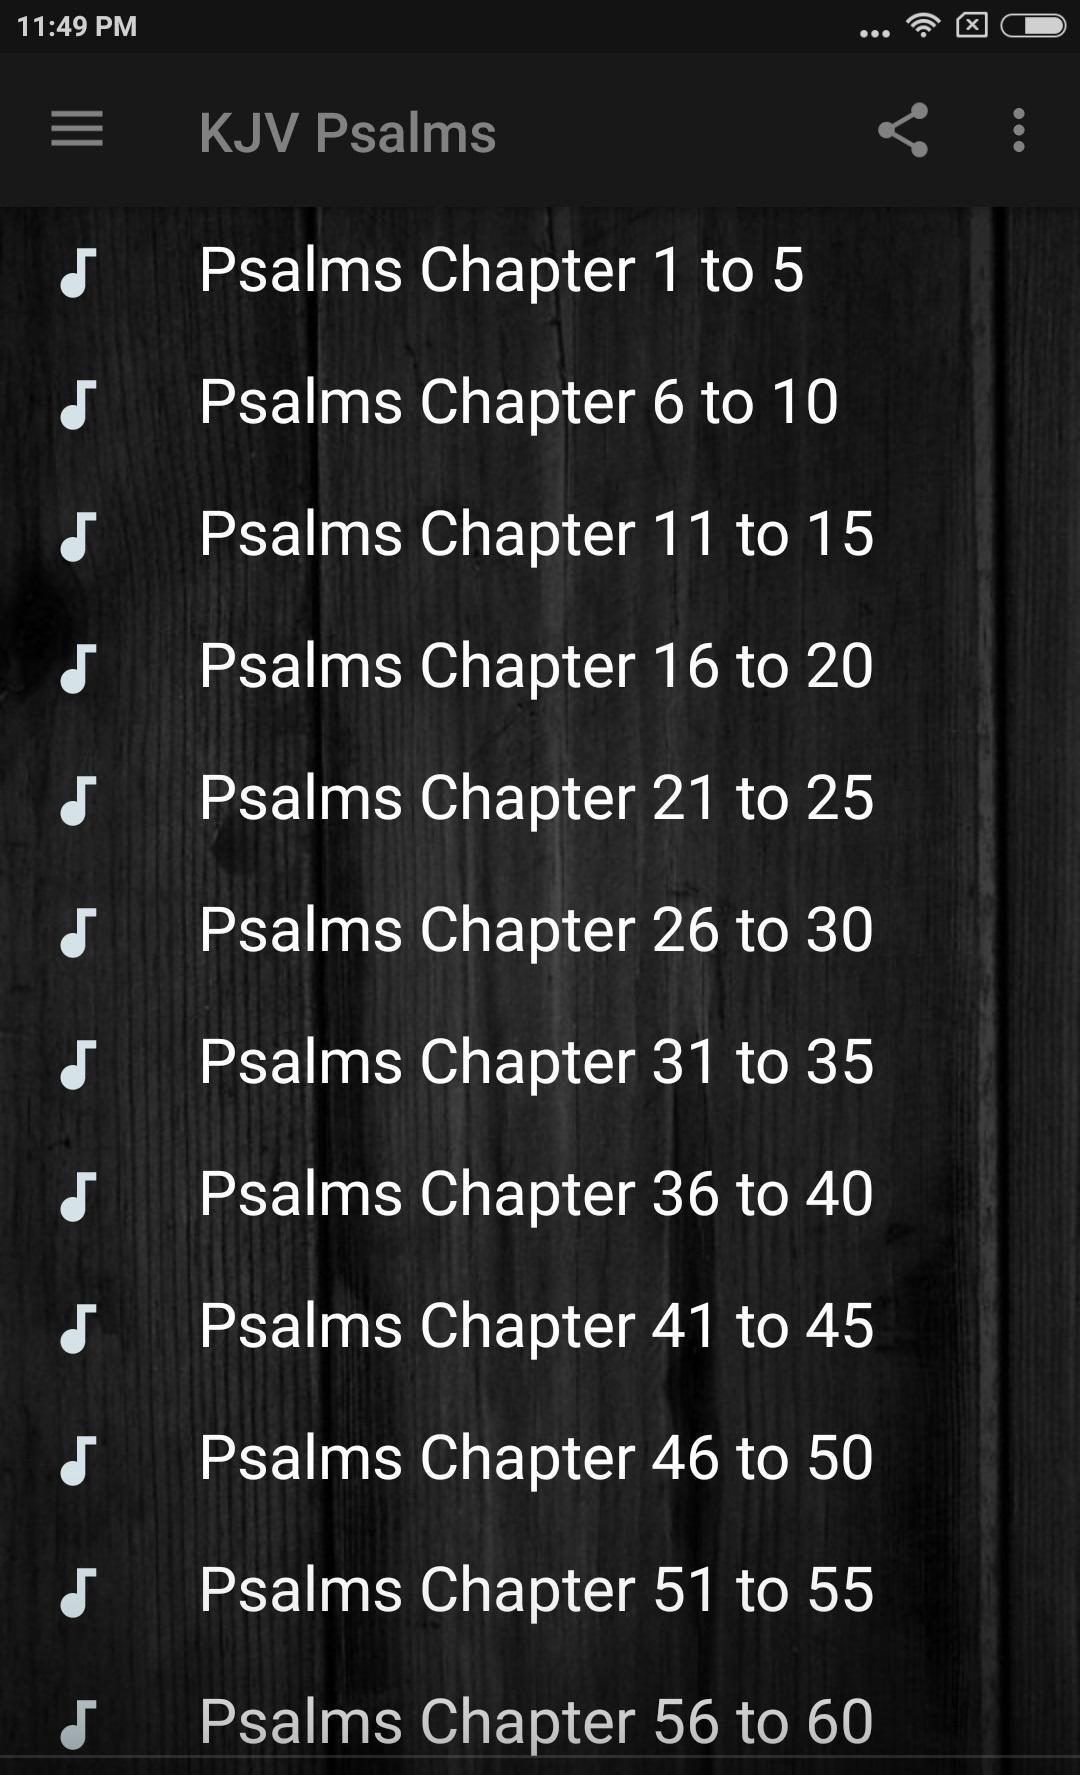 KING JAMES BIBLE (KJV): PSALMS AUDIO for Android - APK Download